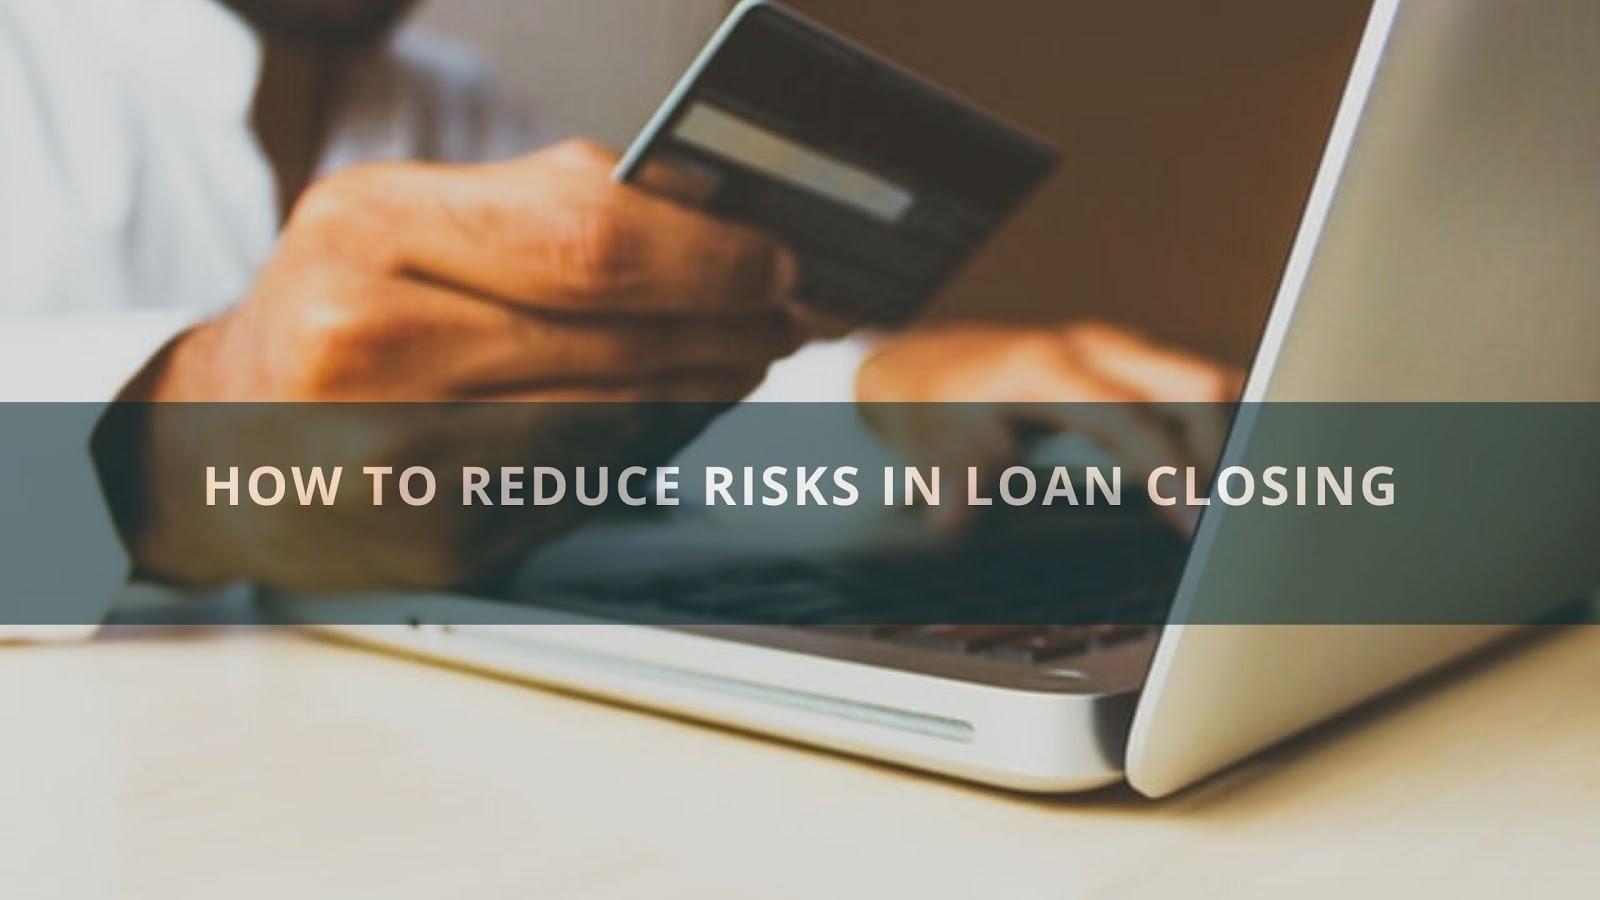 Reduce Risks In Loan Closing